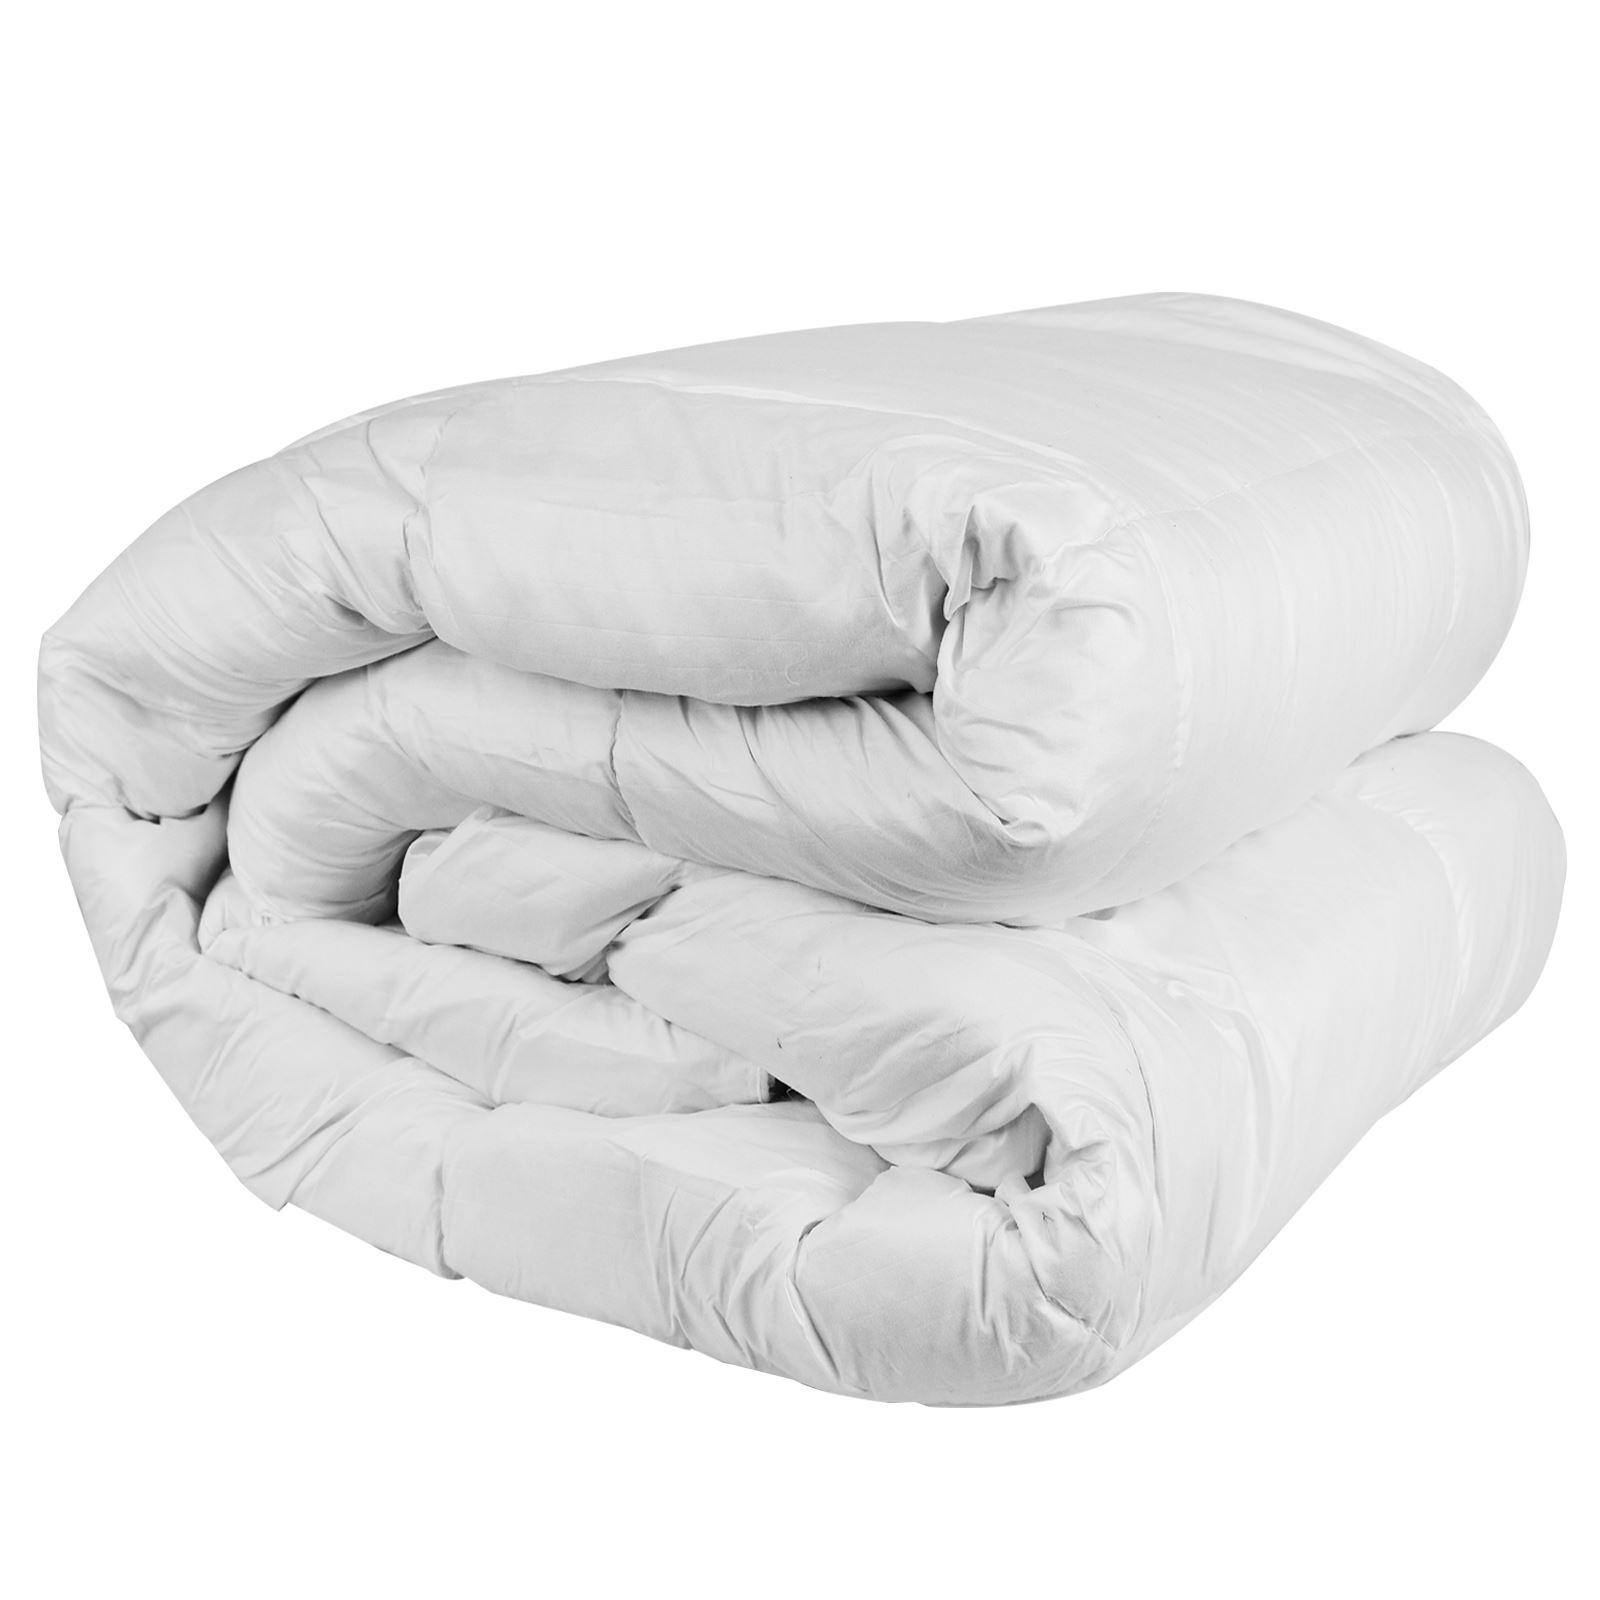 Lujo-Pluma-De-Pato-Abajo-Edredon-Ropa-De-Cama-Edredon-relleno-confortable-13-5-15-Tog miniatura 19